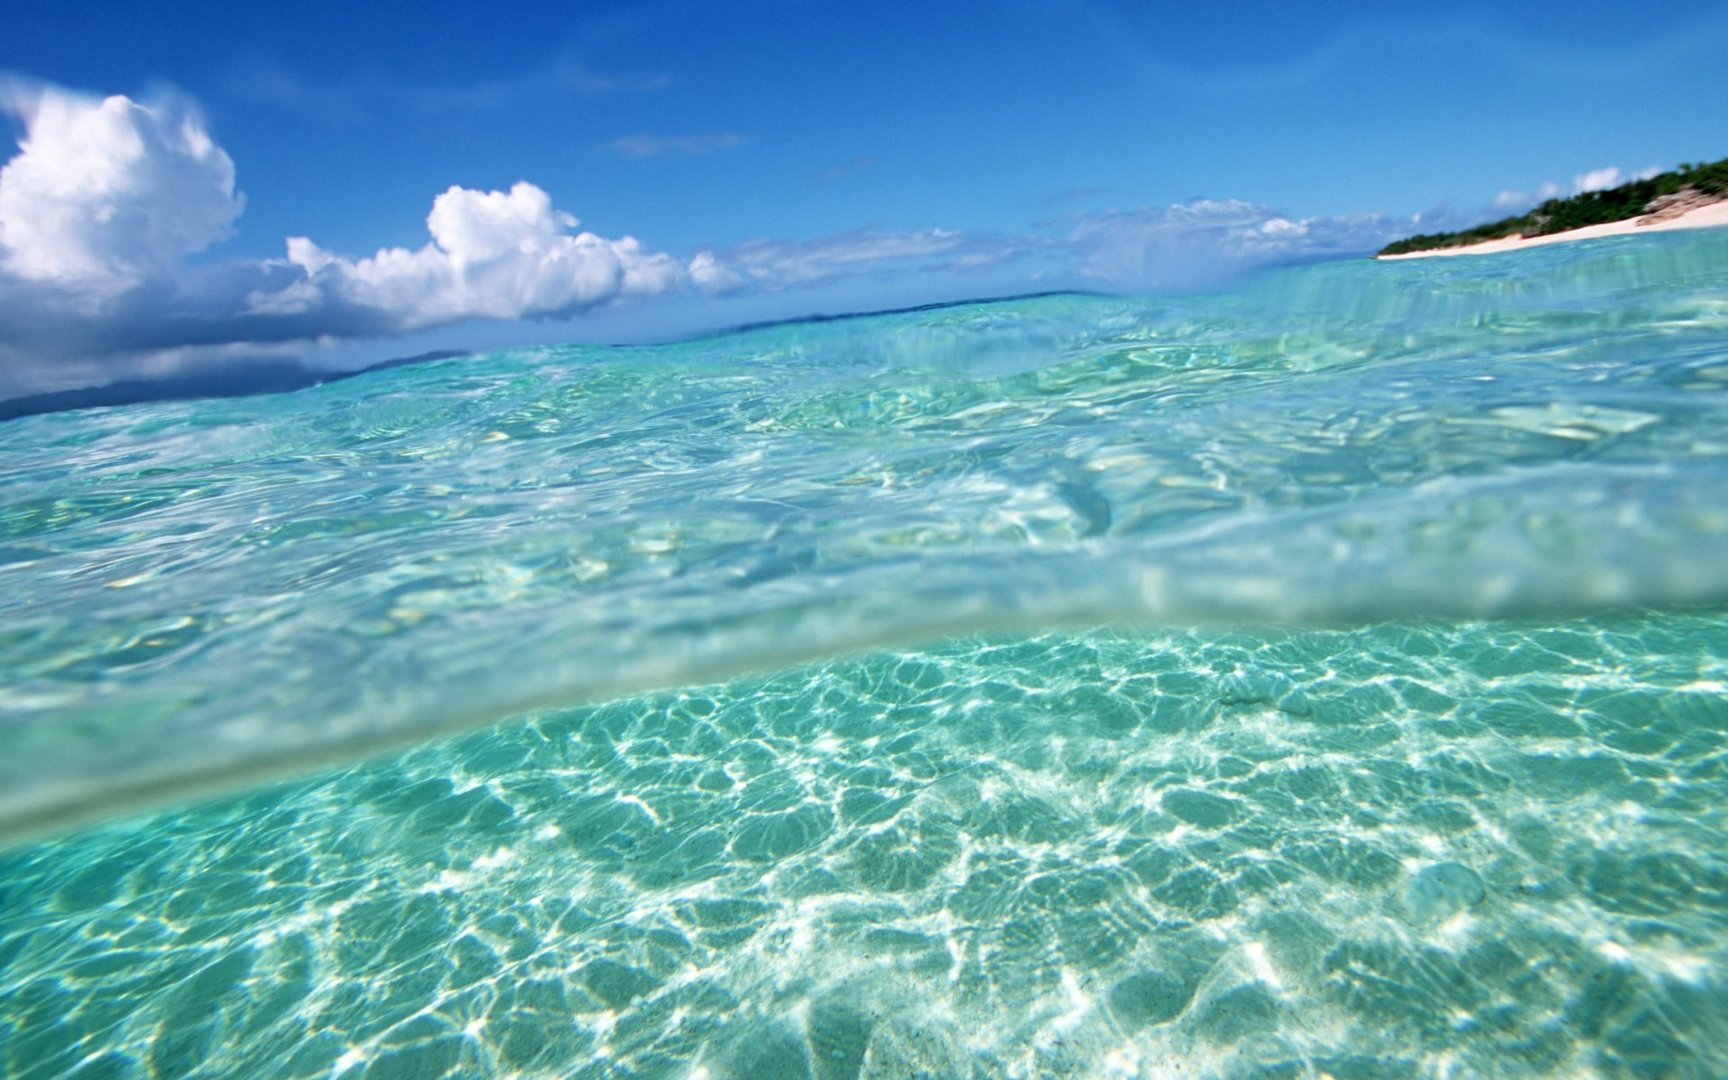 Clear Sea Water wallpaper 1728x1080